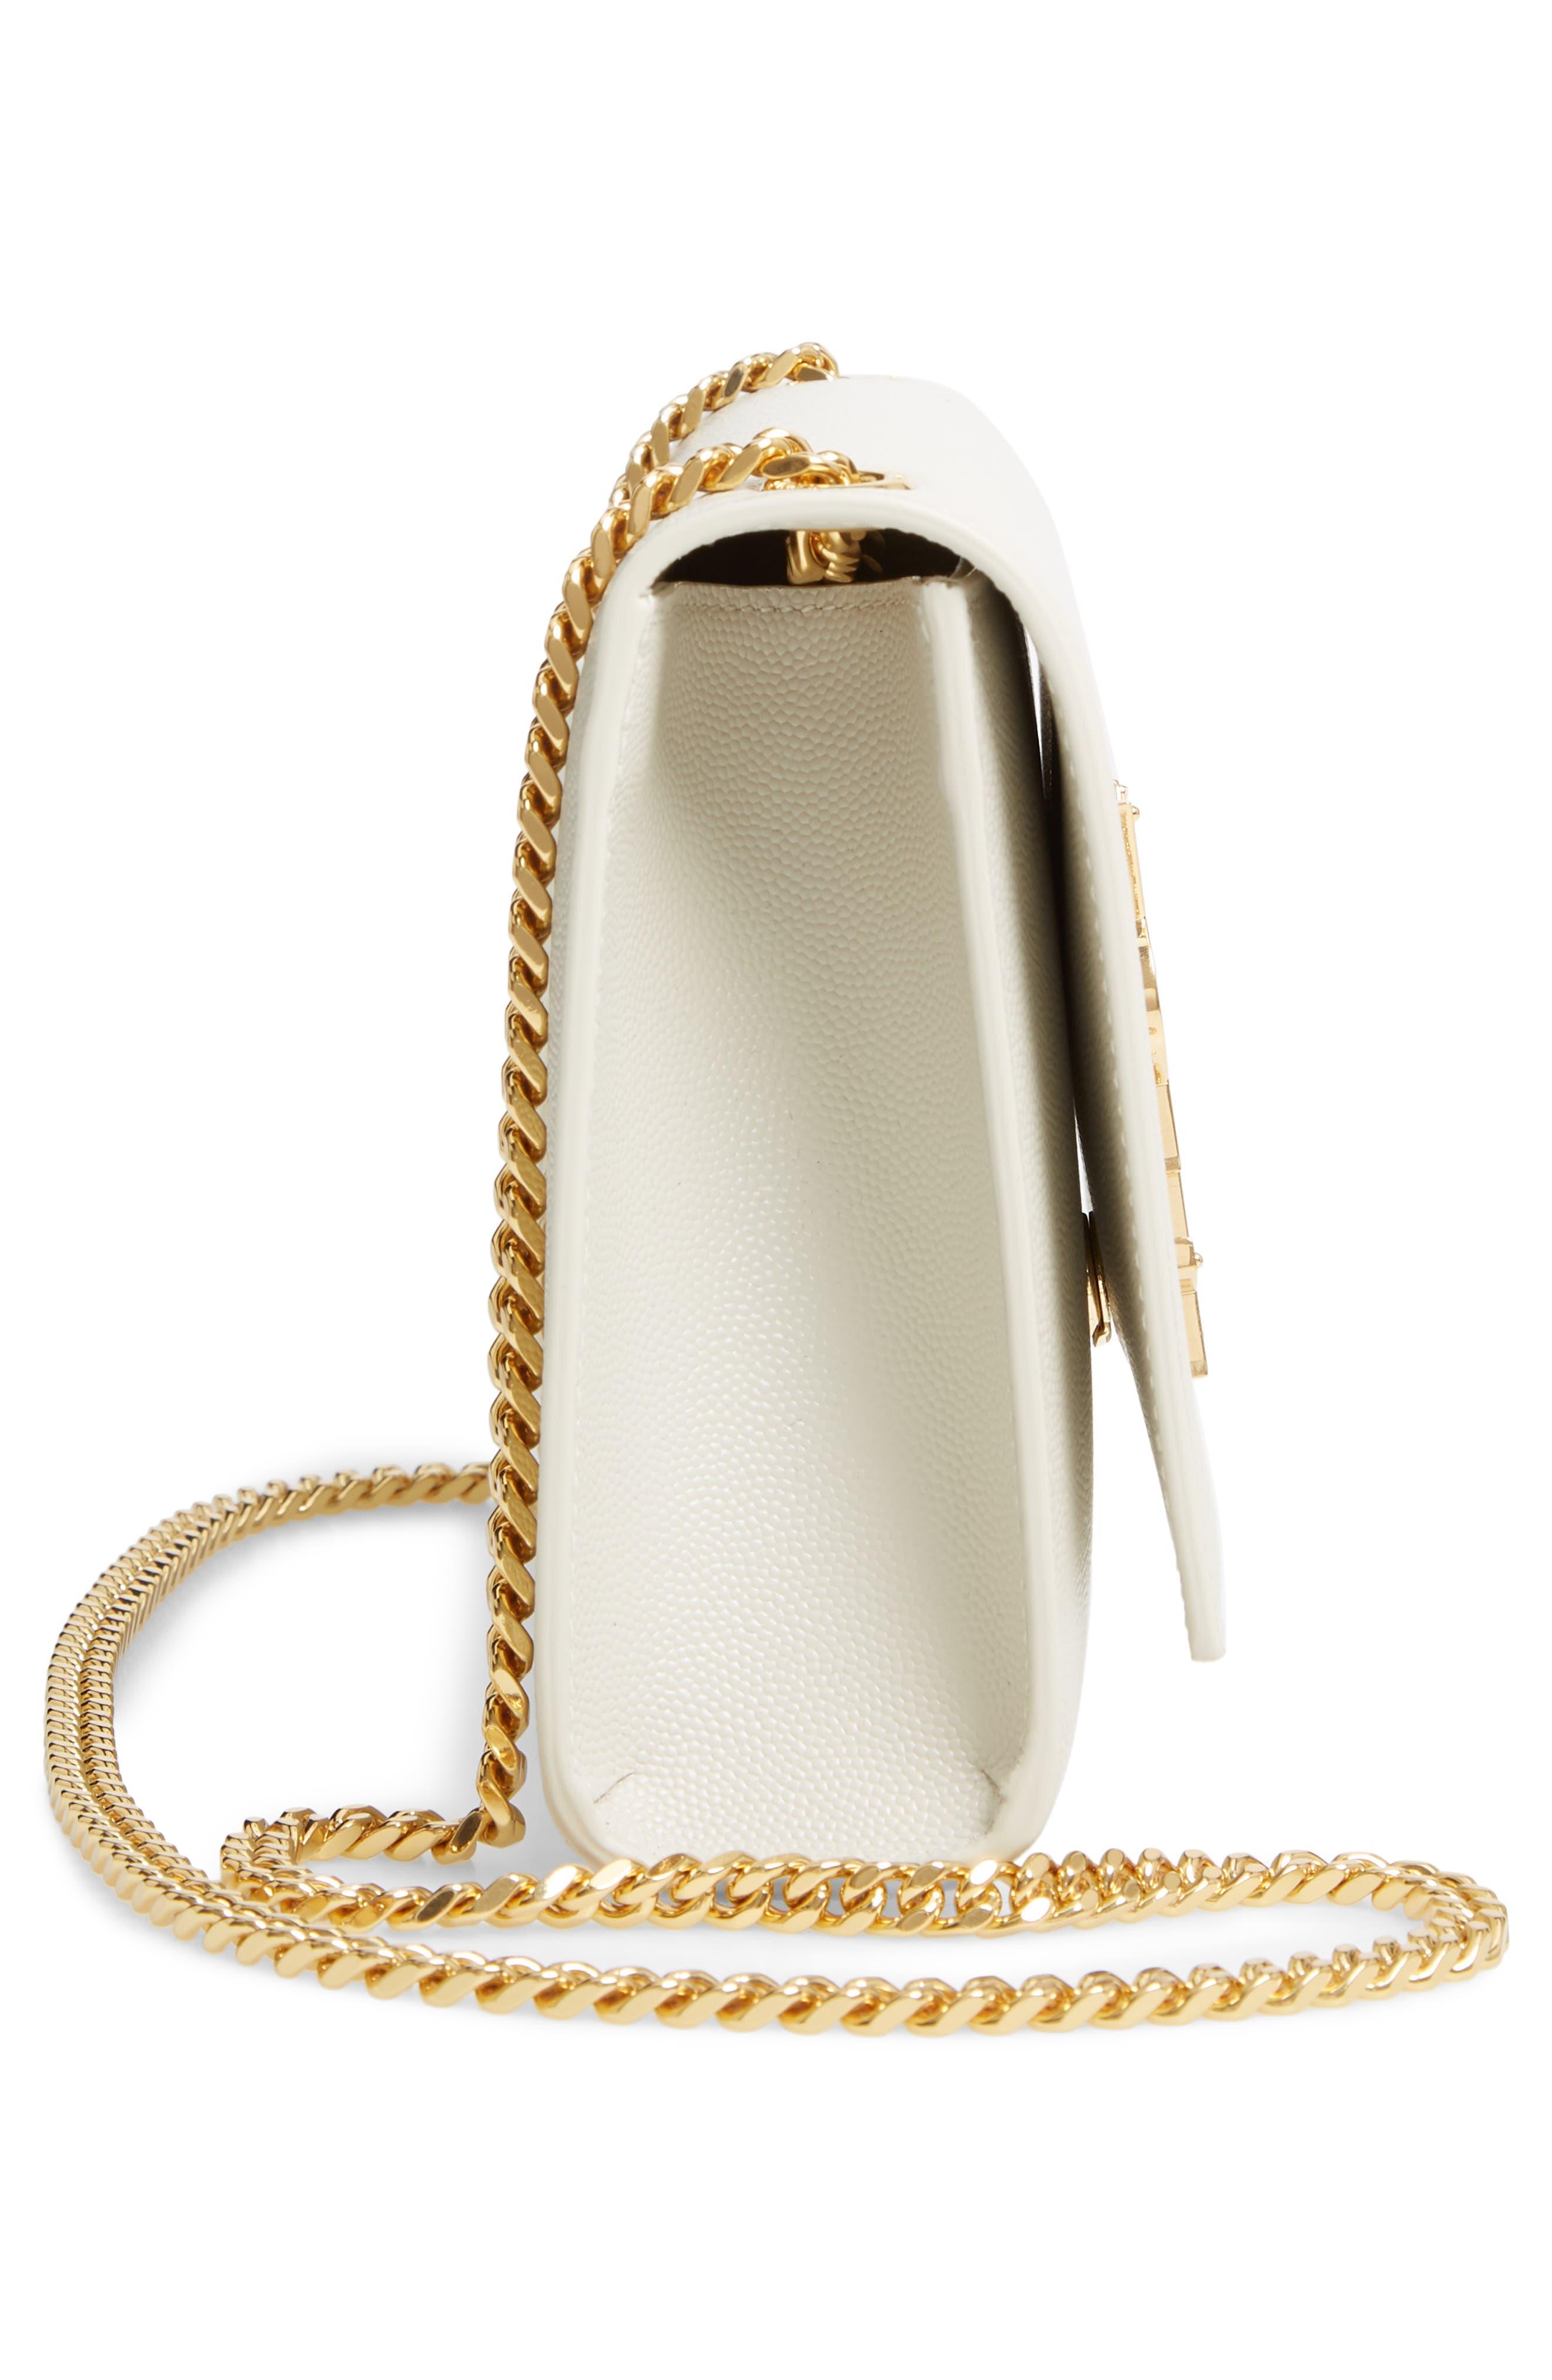 'Medium Kate' Leather Chain Shoulder Bag,                             Alternate thumbnail 5, color,                             CREMASOFT